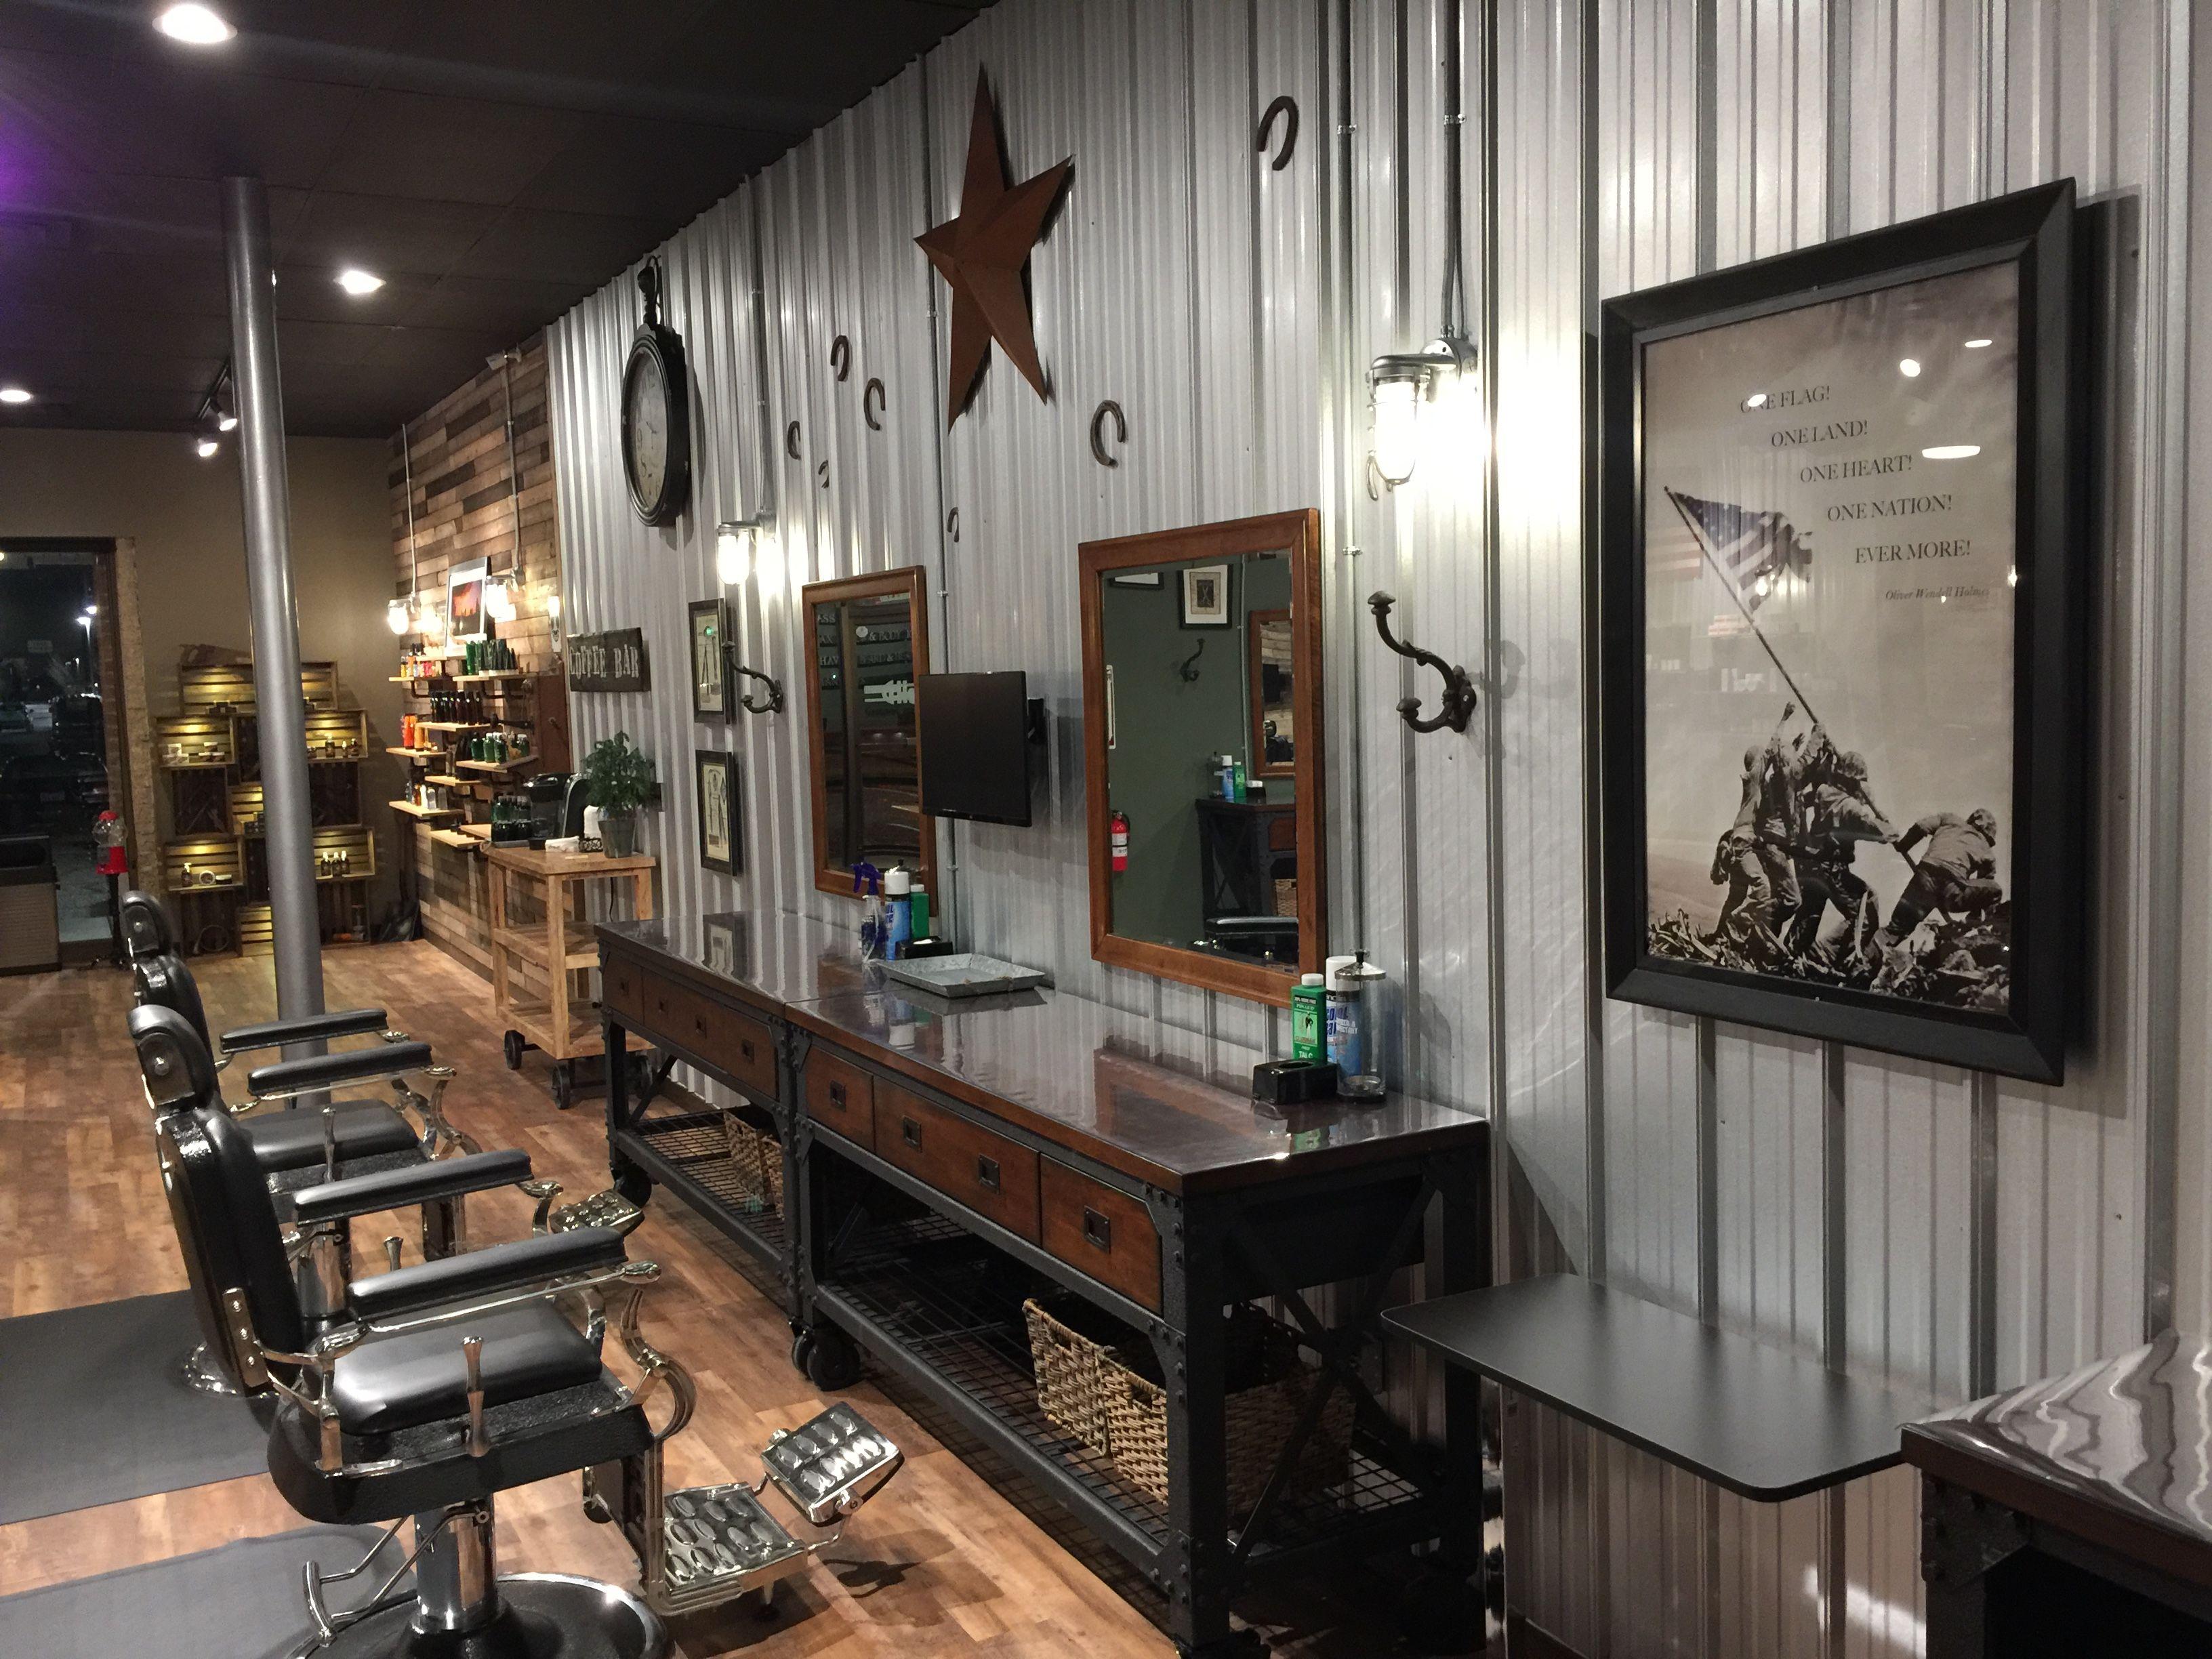 Barber shop barber chairs salon barber shop decor